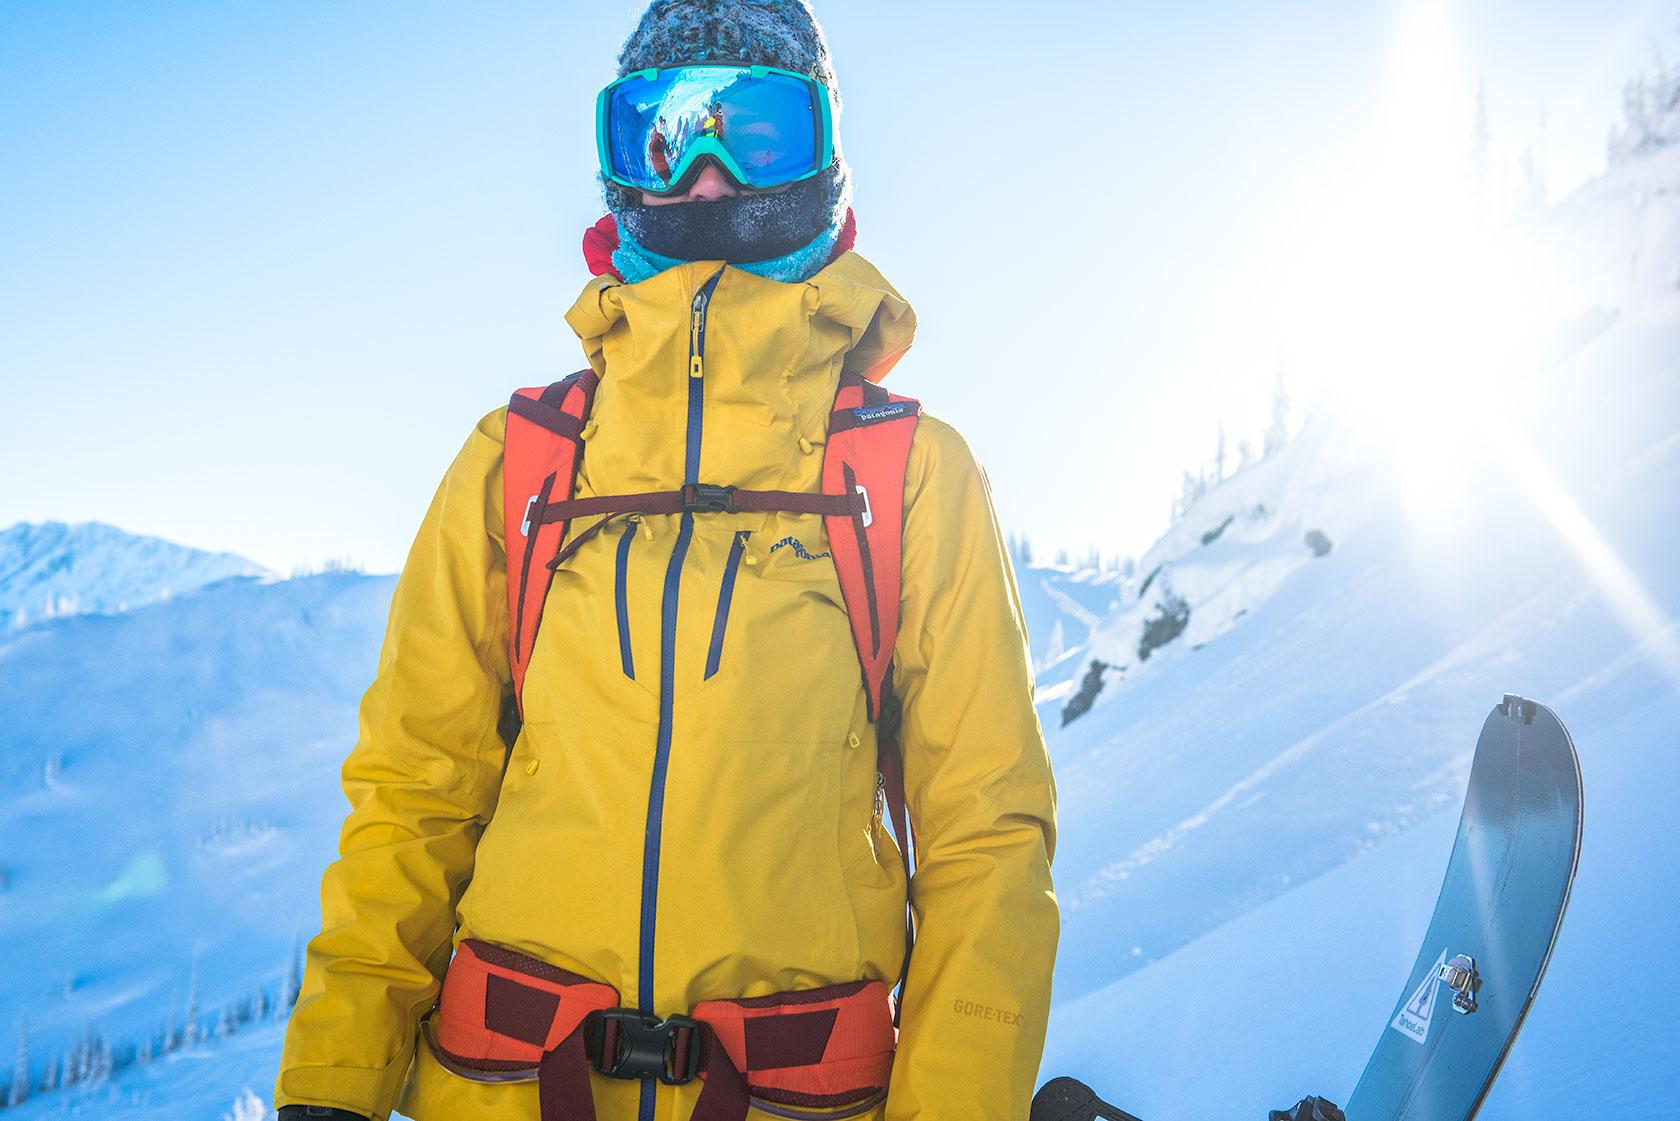 austin-trigg-patagonia-banff-alberta-winter-canada-lifestyle-adventure-mountains-bc-british-columbia-snowboard-sunset.jpg